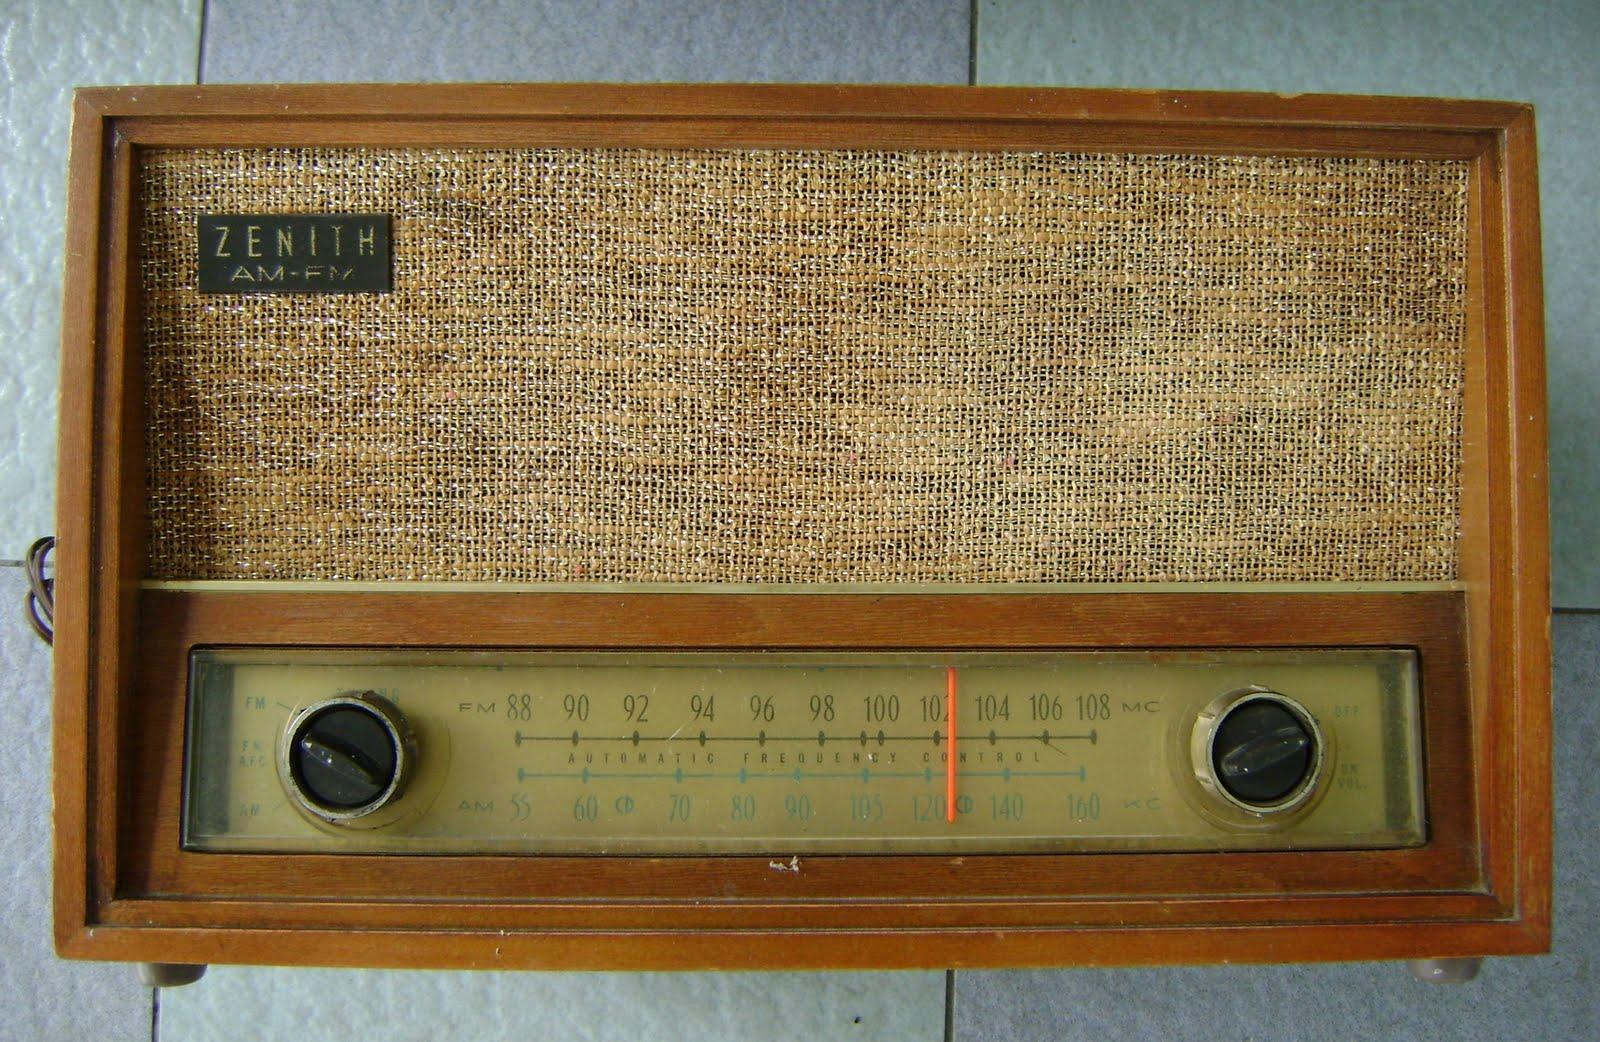 Kinta Valley Audio Zenith Model C730 Tube Radio Used Sold. Zenith Model C730 Tube Radio Used Sold. Wiring. Zenith Radio Schematics Model C730 At Scoala.co